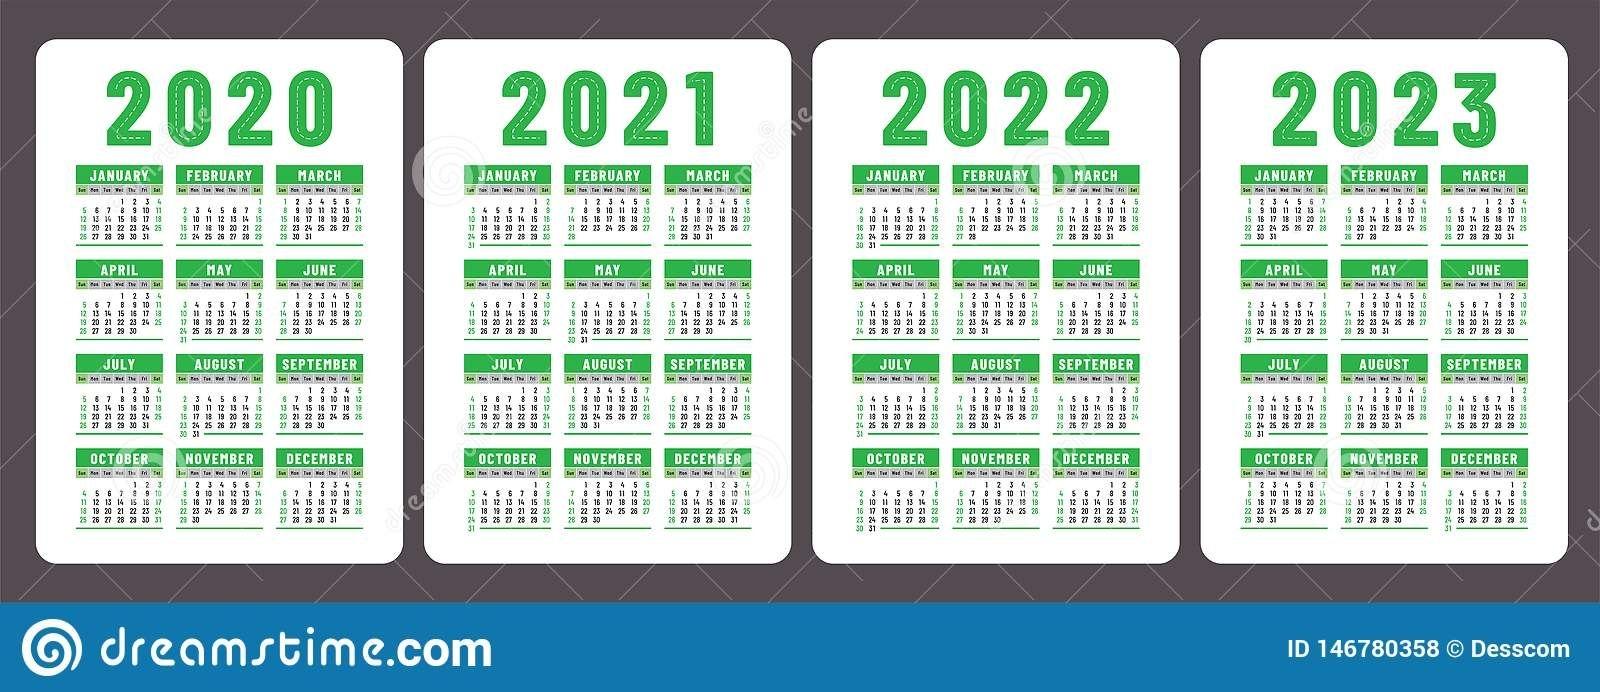 Calendar 2020, 2021, 2022 And 2023. English Color Vector